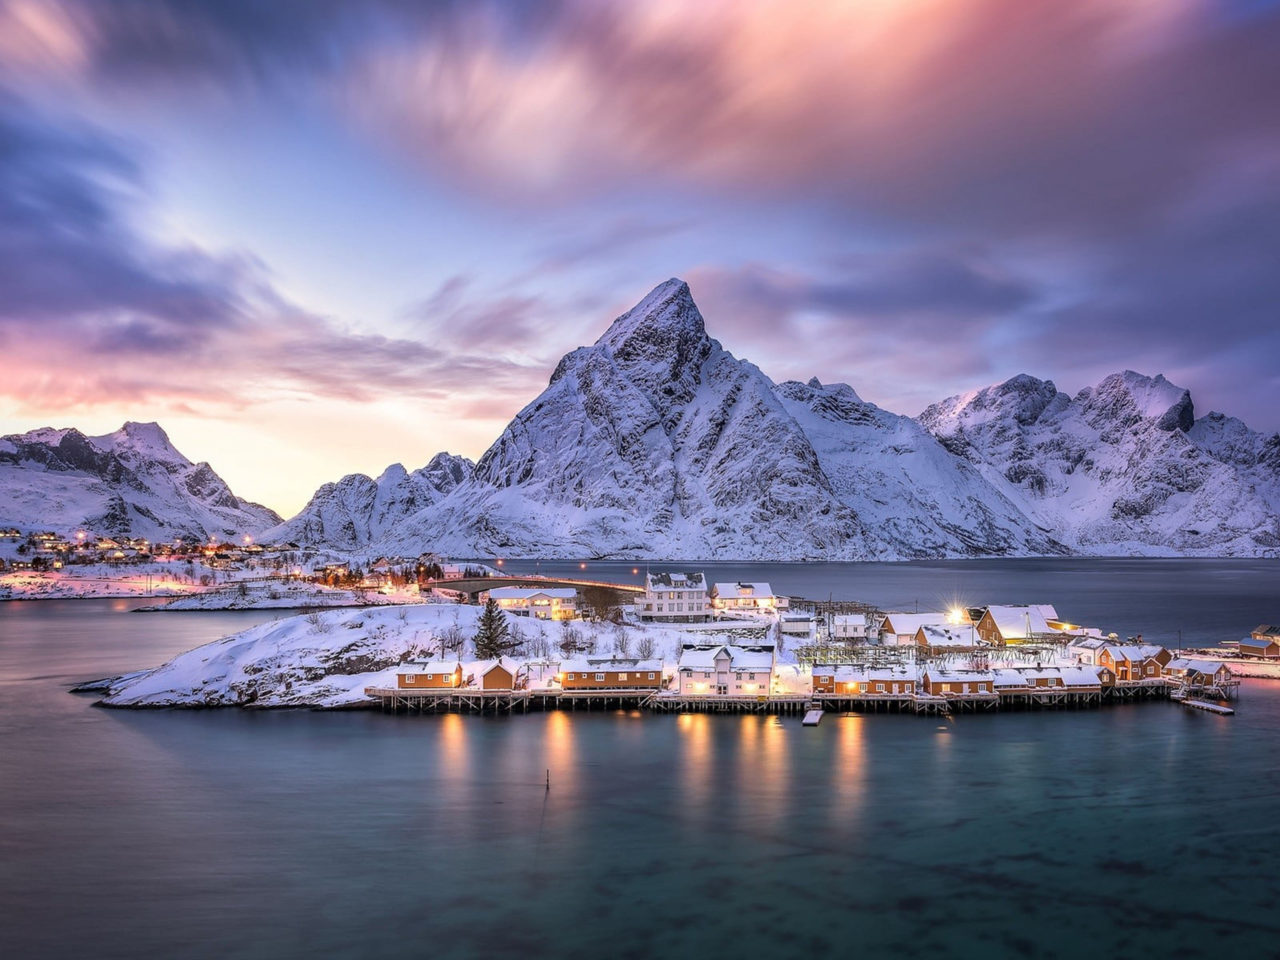 Hd Christmas Wallpaper For Ipad Norway Islands Lofoten Archipelago Norway Reine Landscape